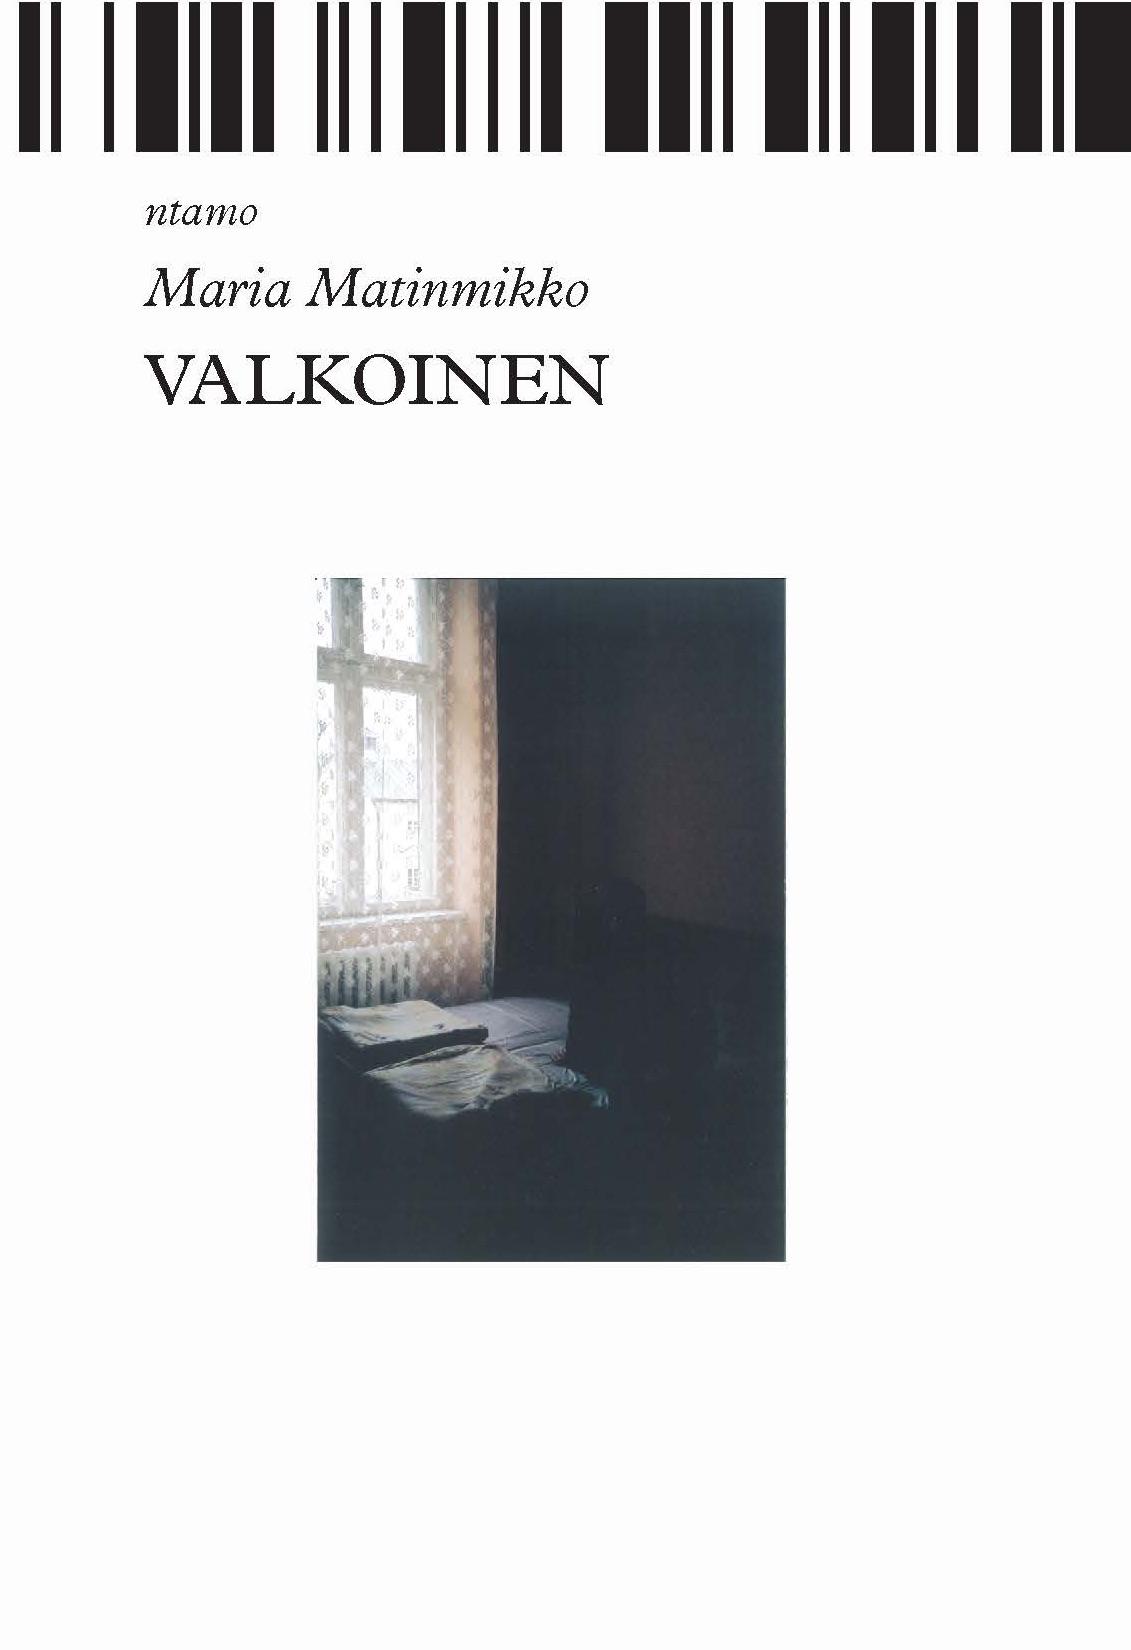 Matinmikko, Maria - Valkoinen, ebook